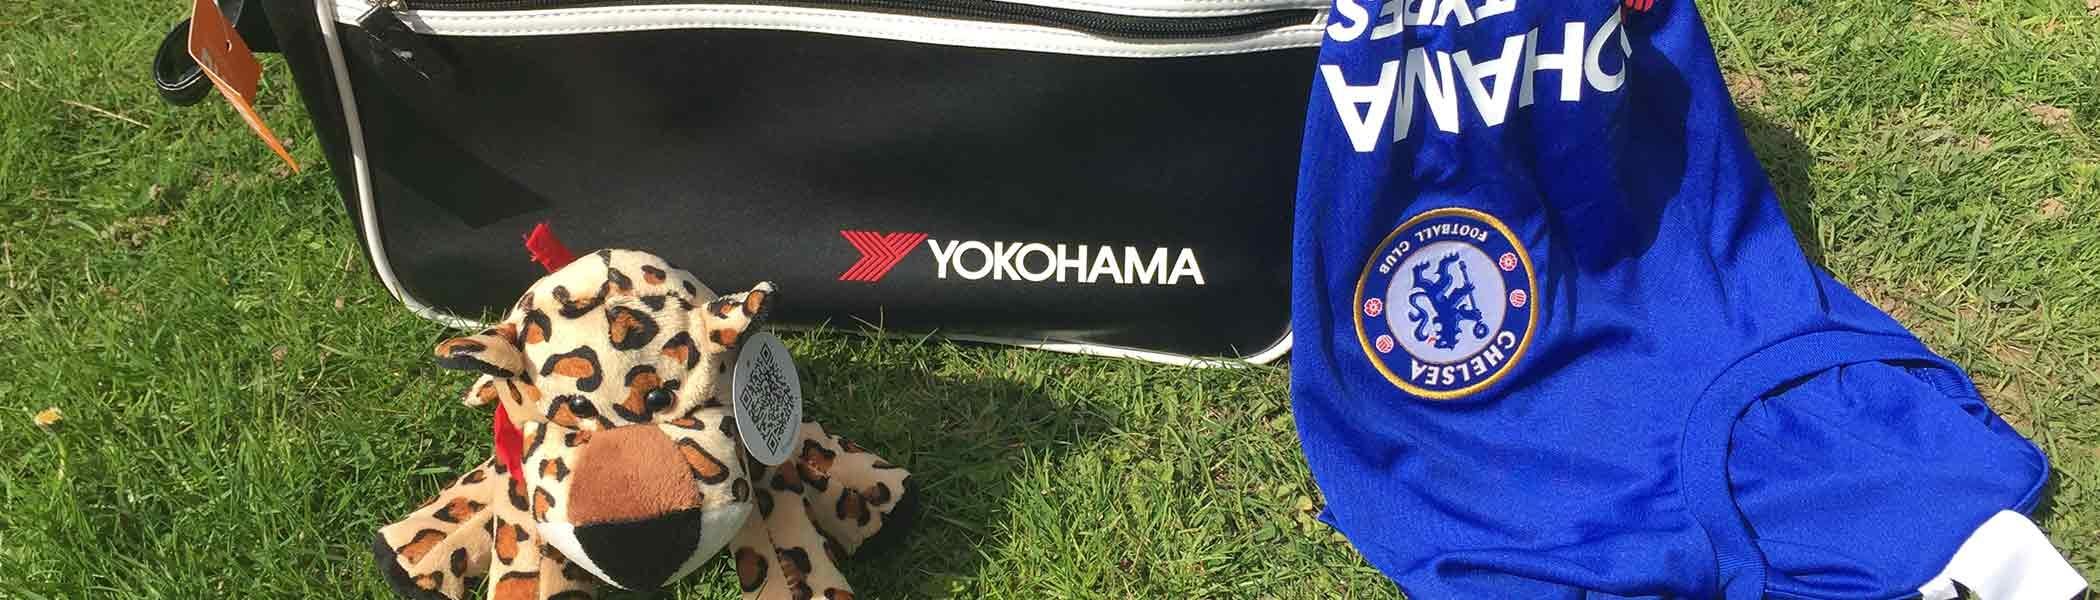 Neue Yokohama Produkte